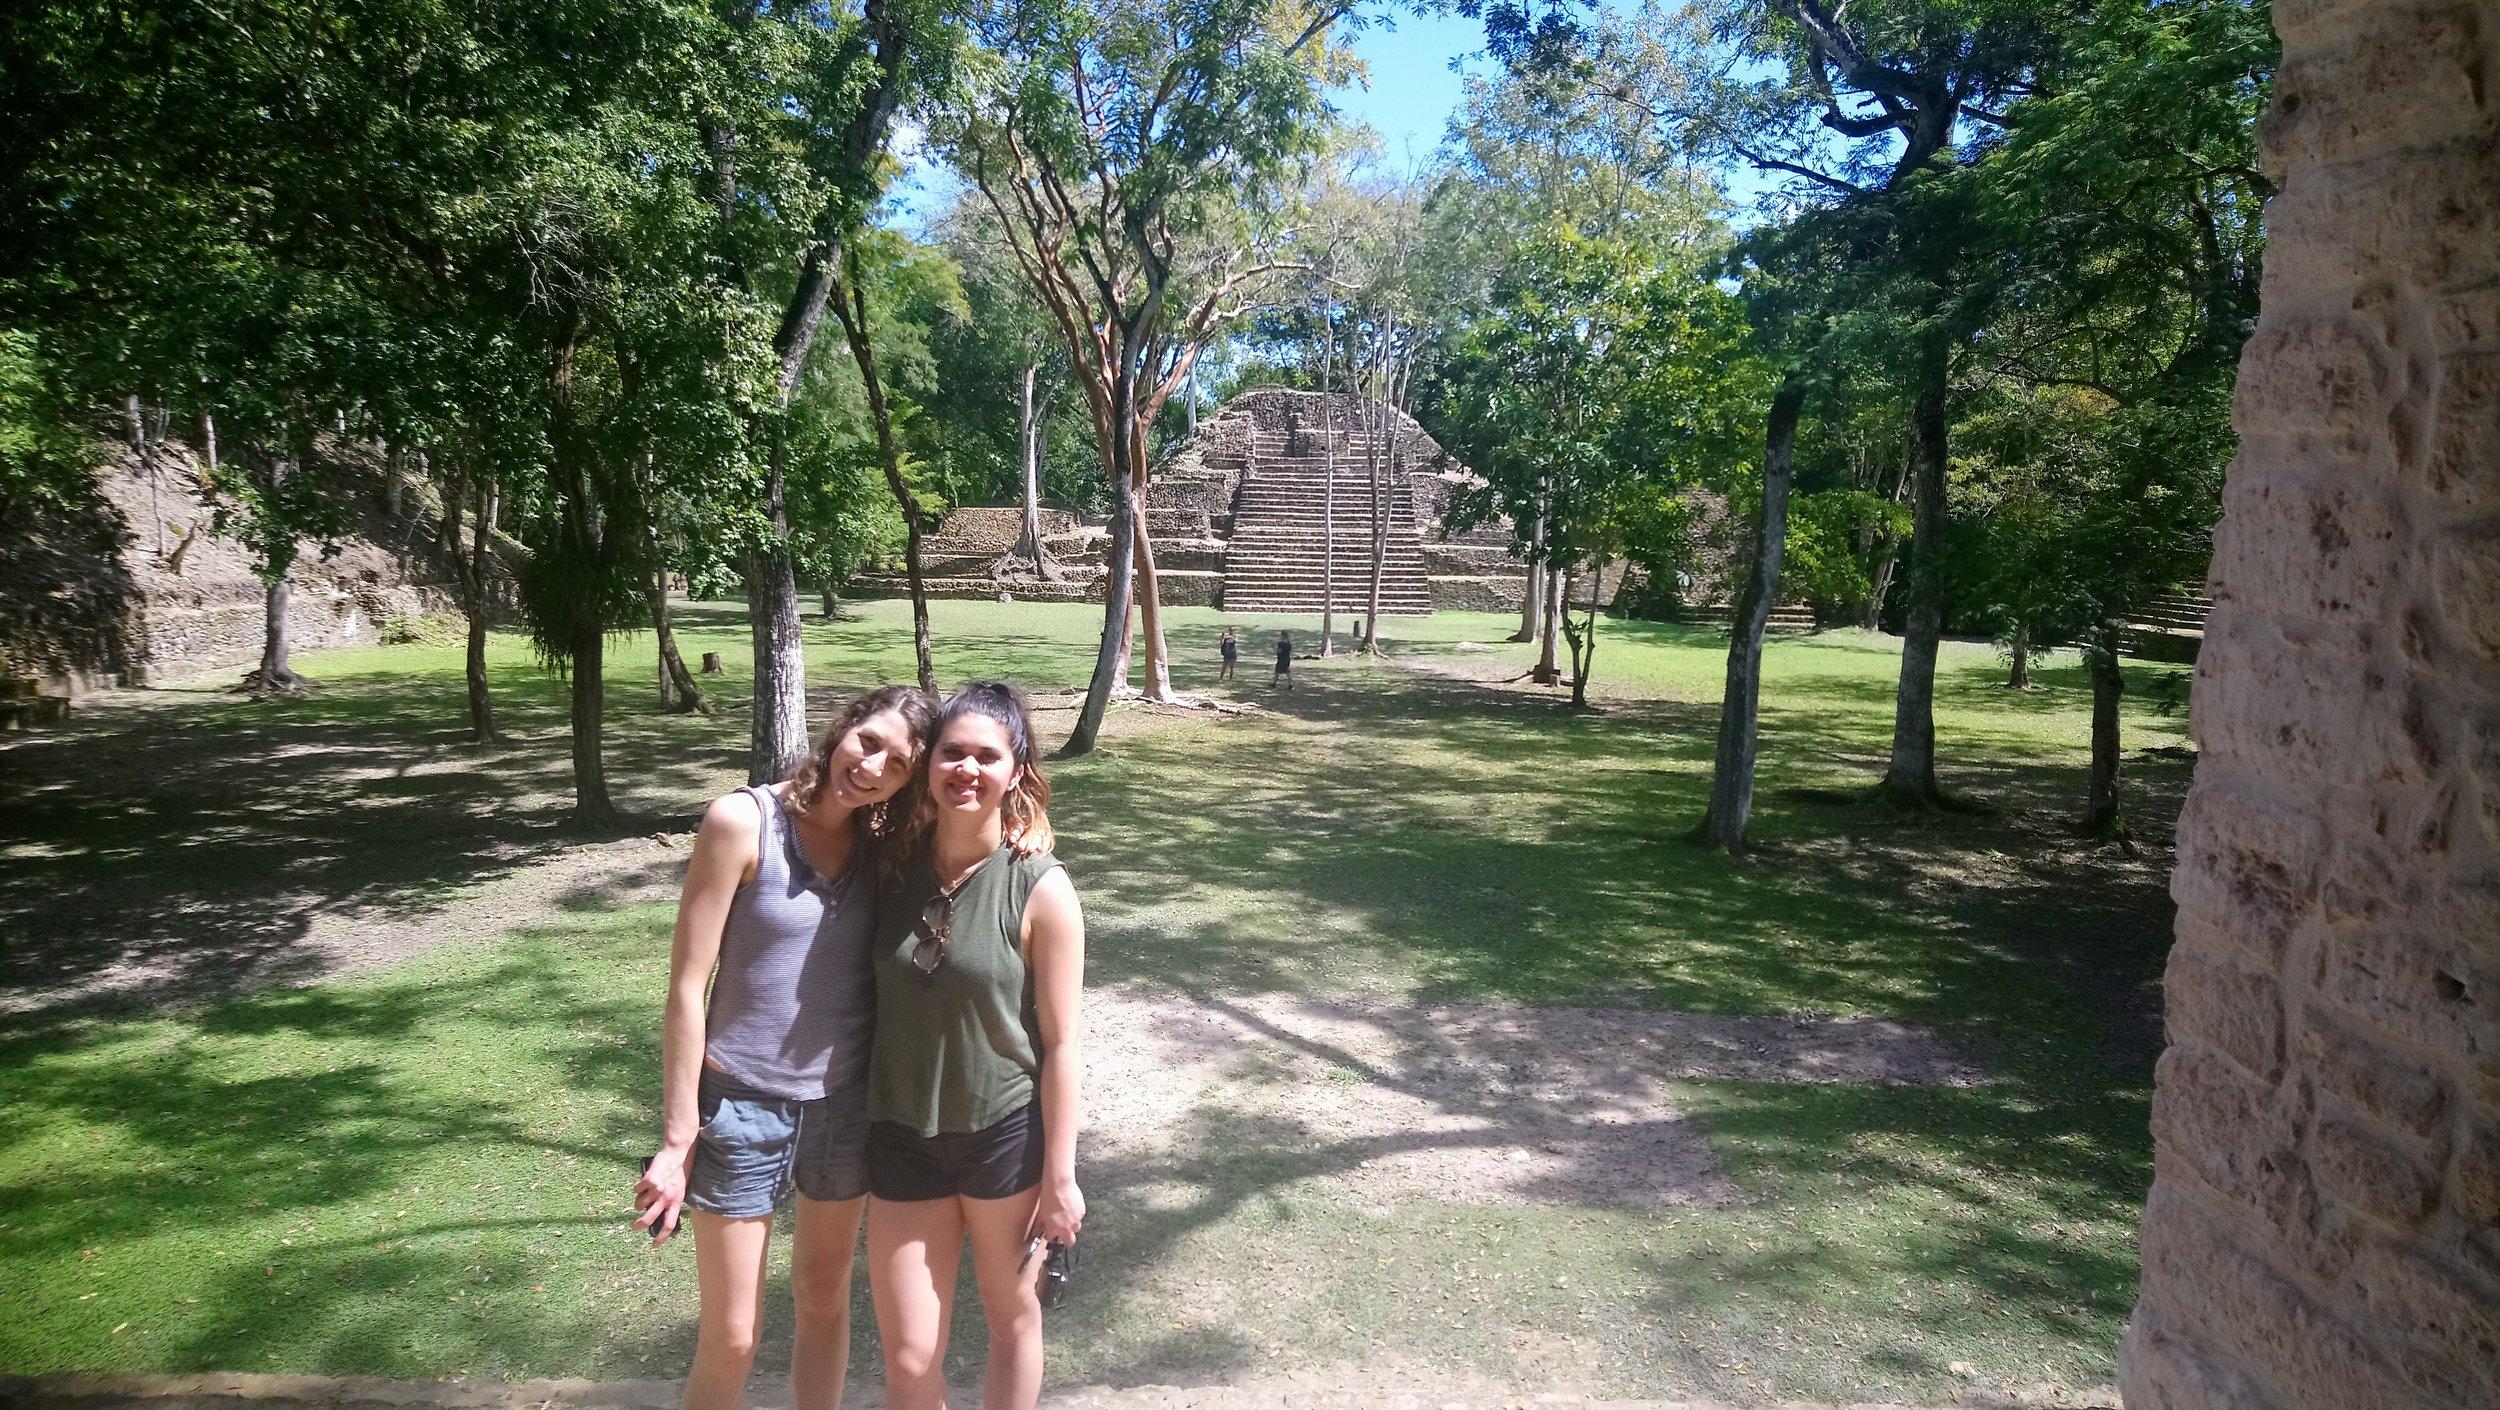 TREE Belize trip participants Zandra Thomson (@lifewithzandra) and Vanessa Hanel (@microyyc)